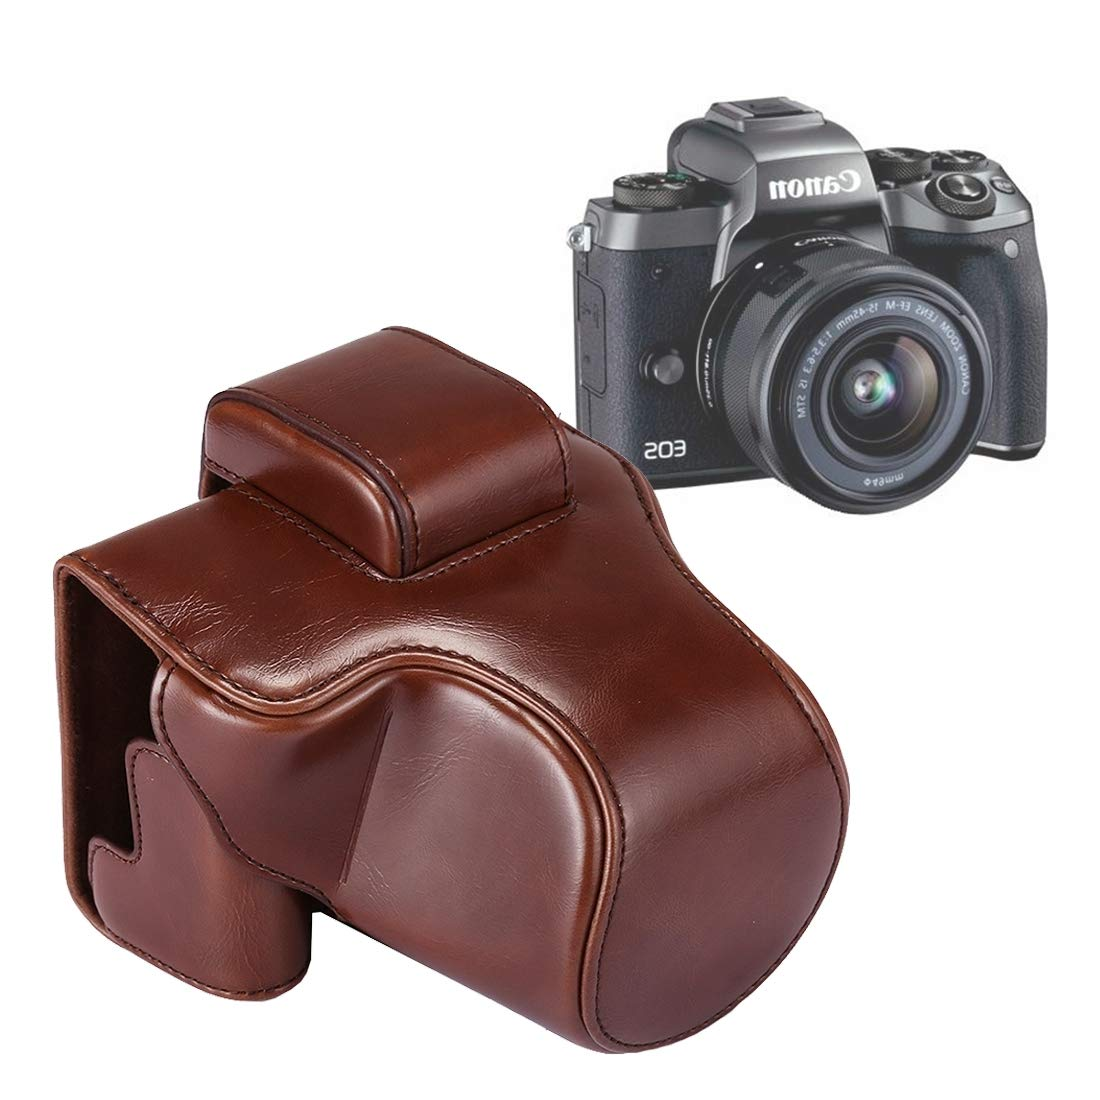 ShenBiadolr カメラケース フルボディカメラ PUレザーケースバッグ ストラップ付き Canon EOS M5用, ShenBiadolr B07M8VCB85 コーヒー